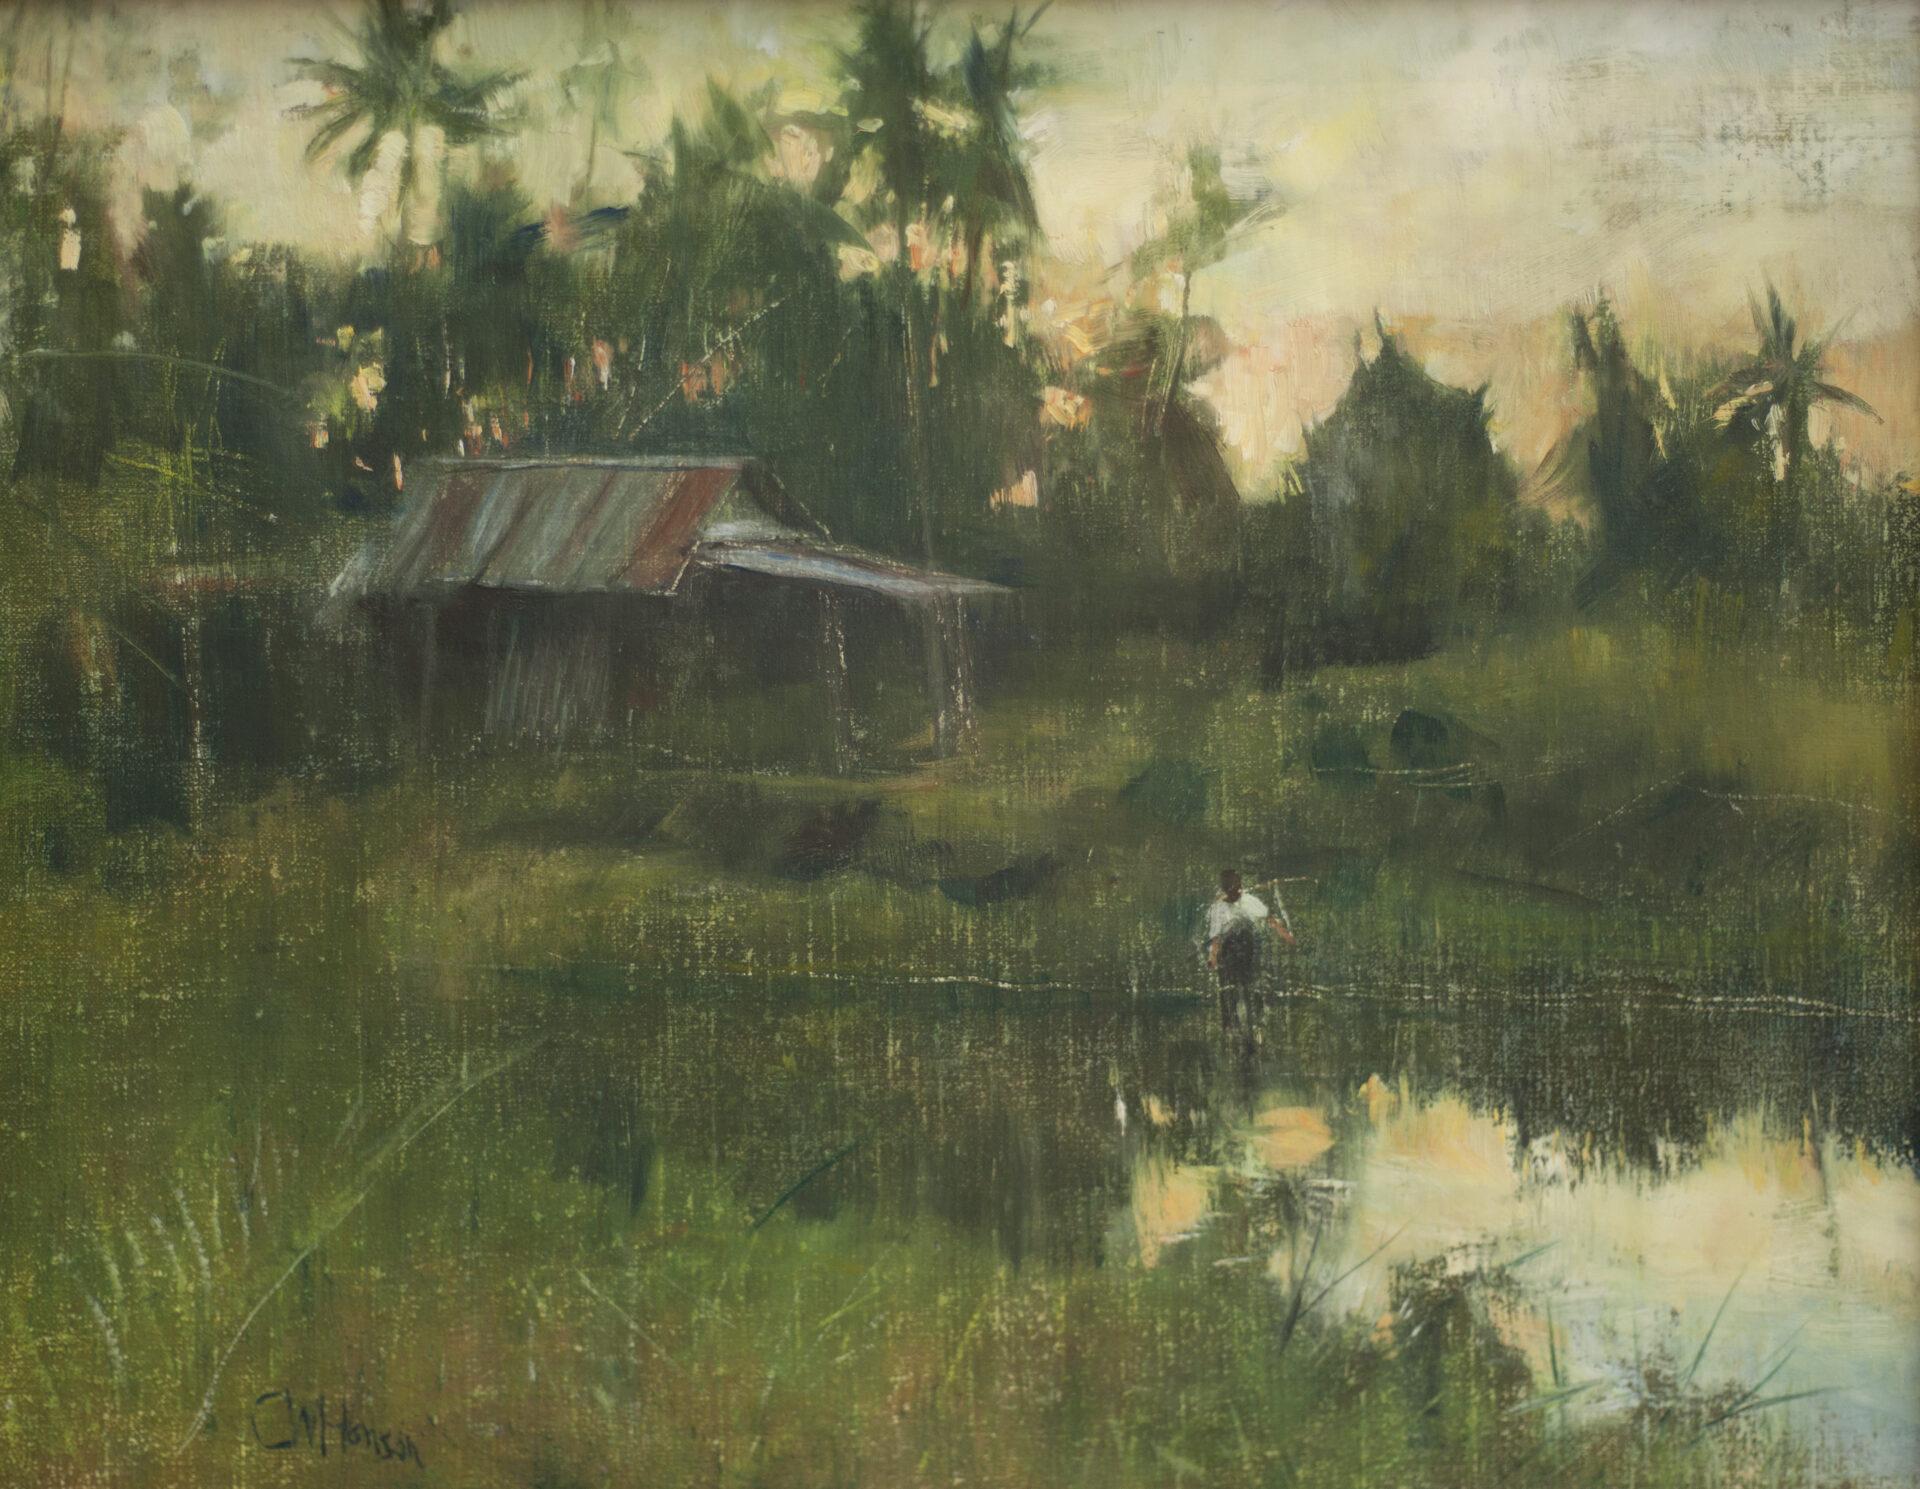 Curt Hanson - Reflections at Dusk